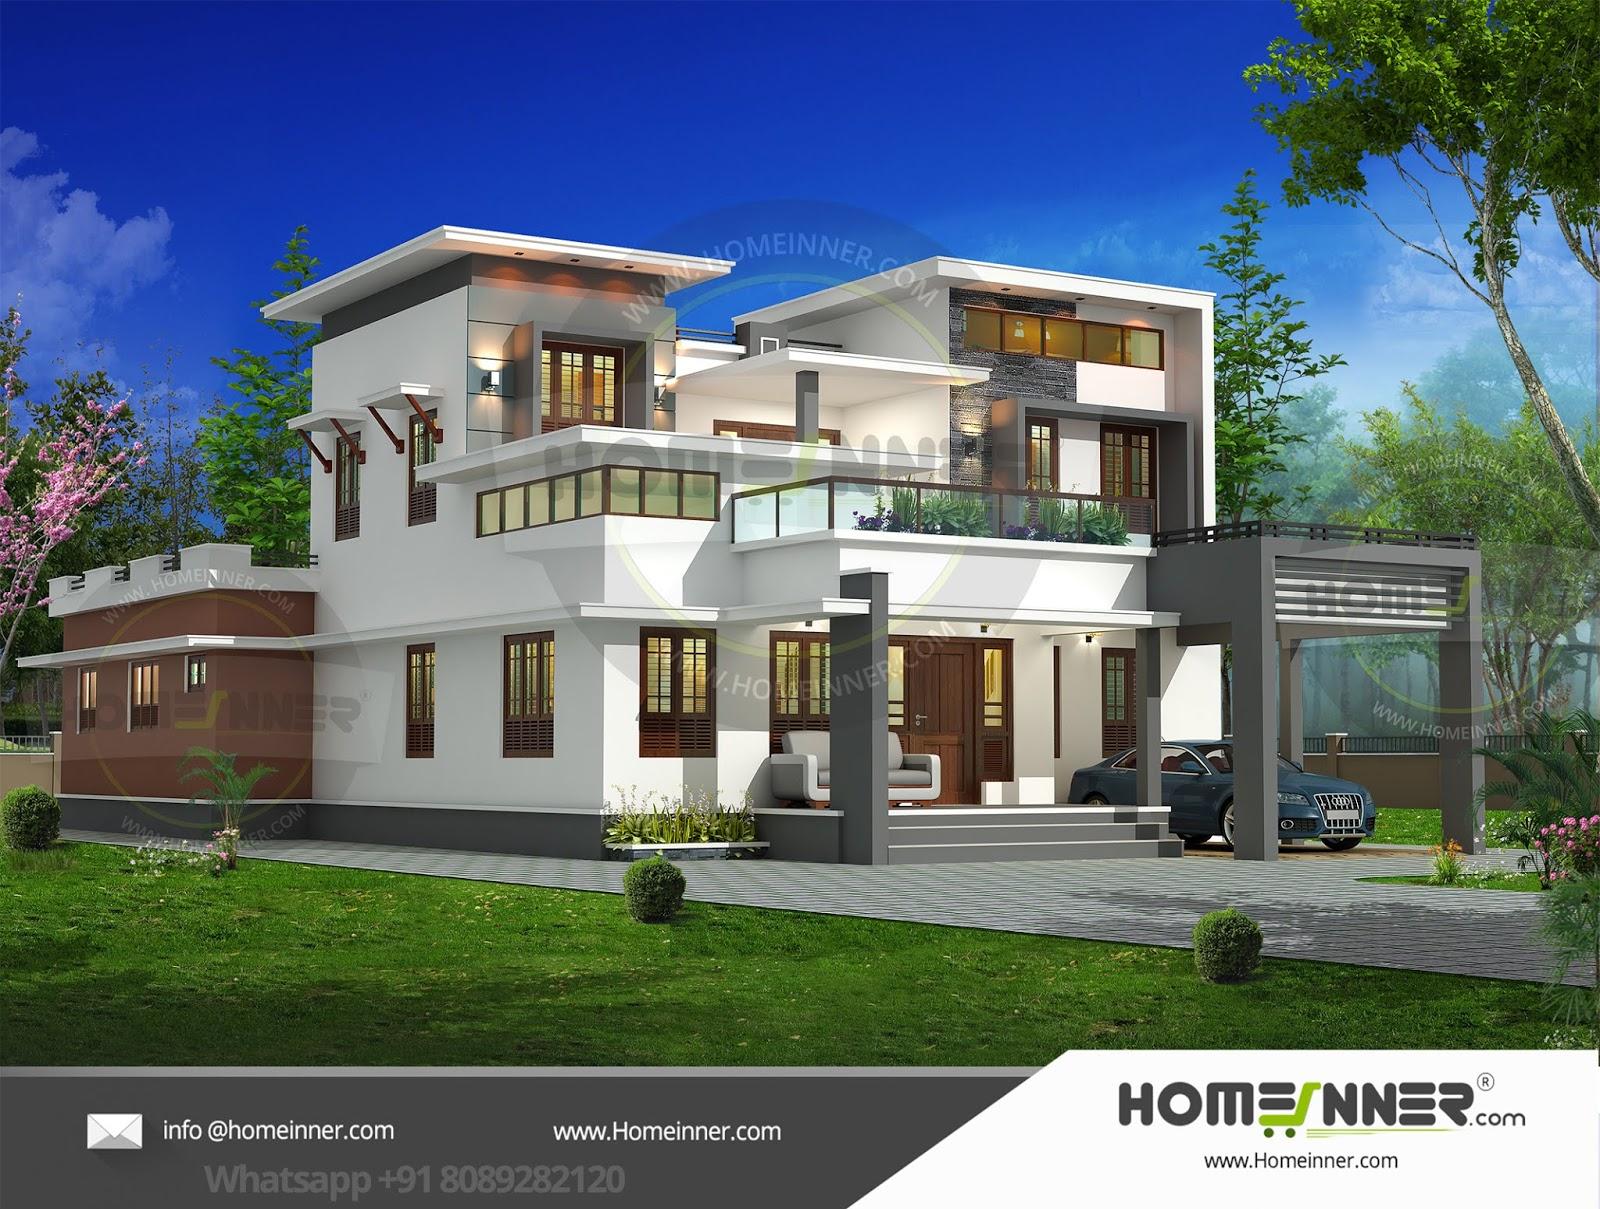 49 Lakh 5 BHK 3487 sq ft Jamshedpur Villa